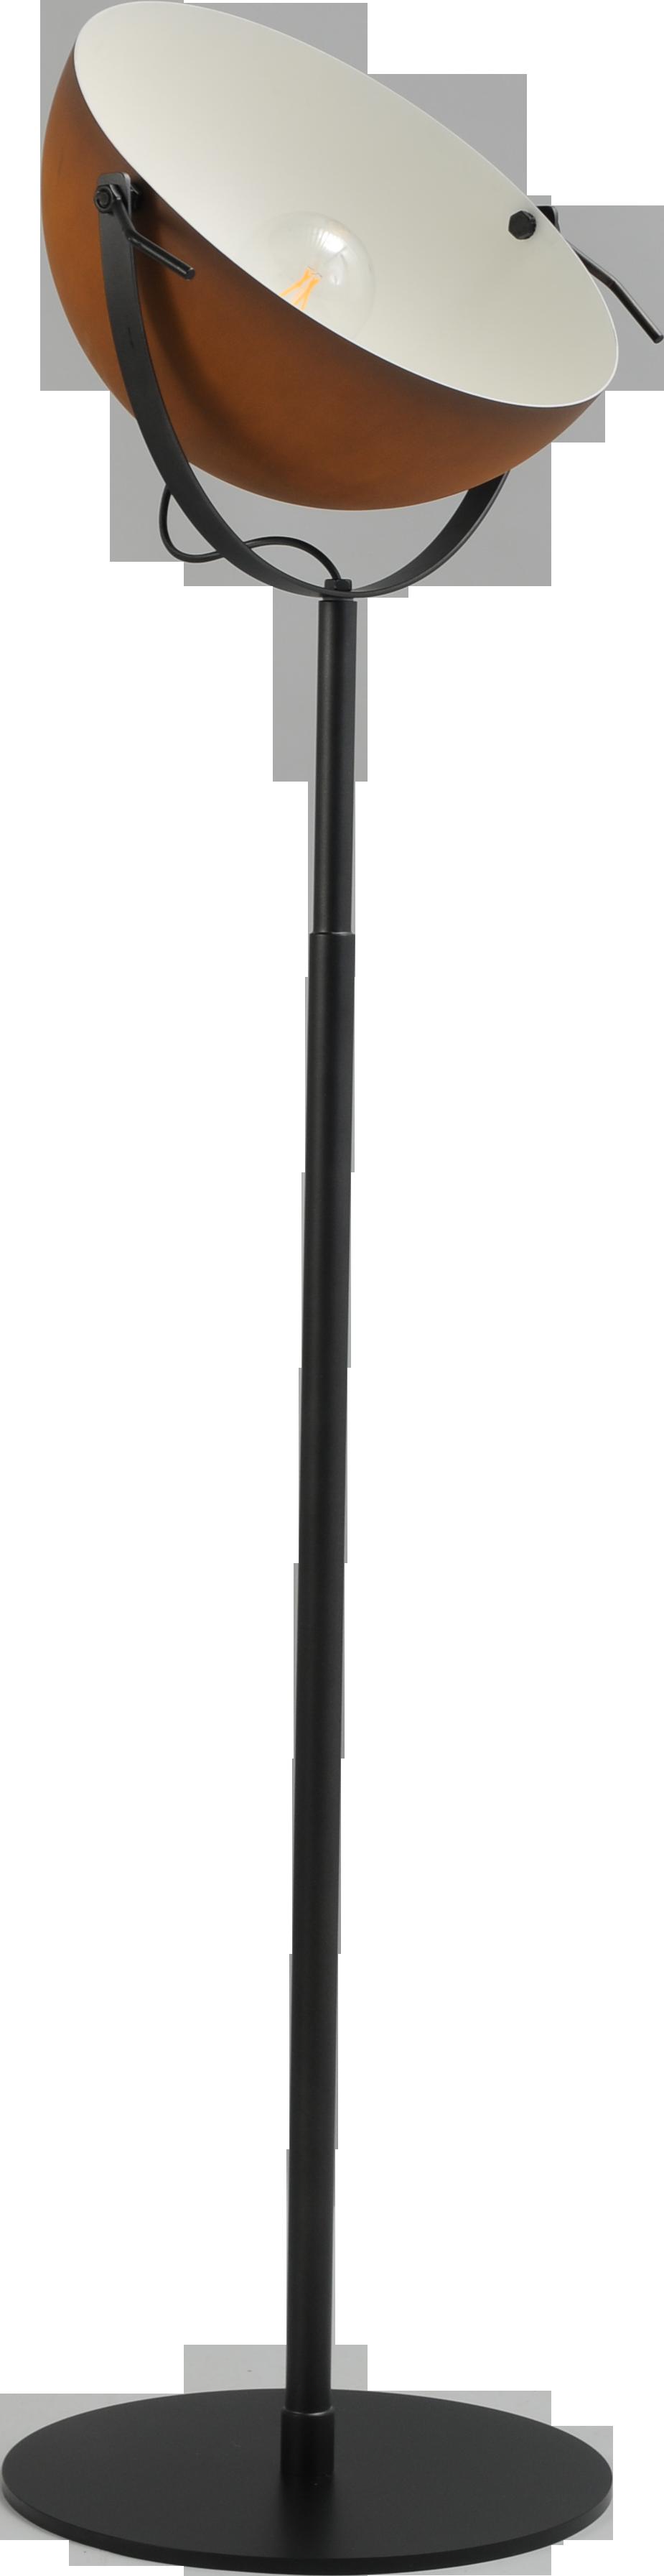 Larino Bow VL LARINO BOW H.175CM D.40CM RUST